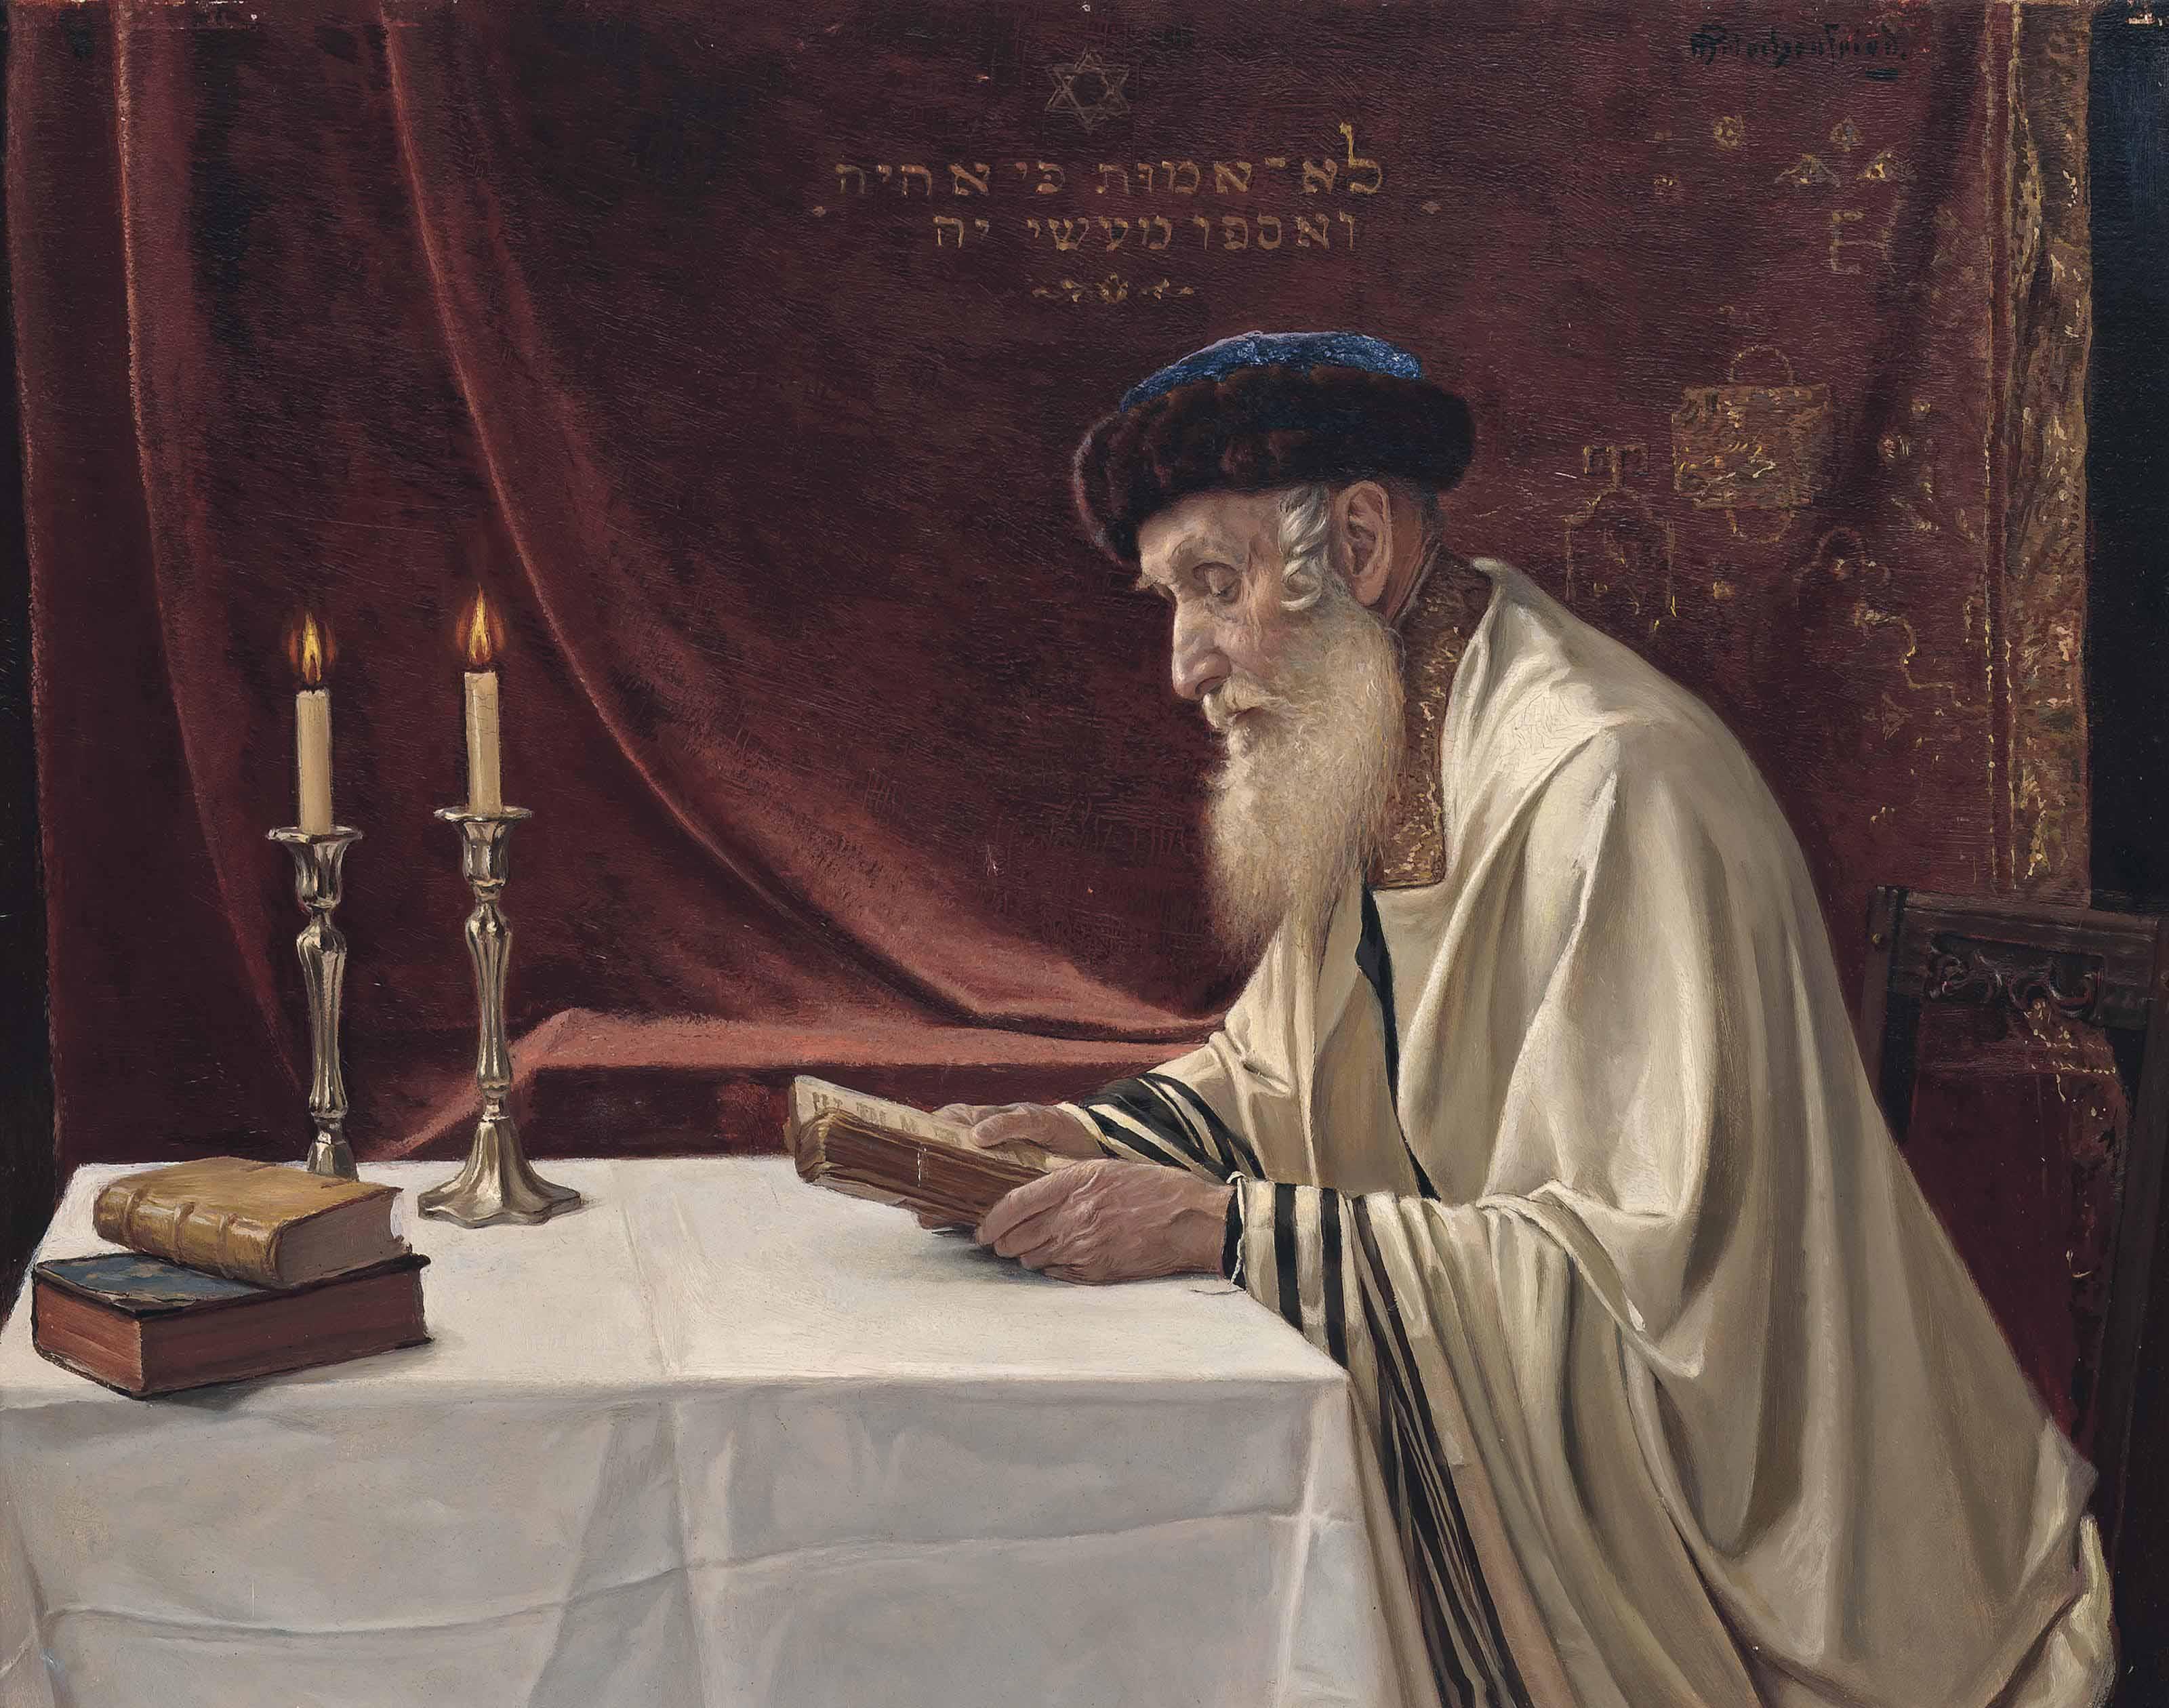 A Rabbi reading